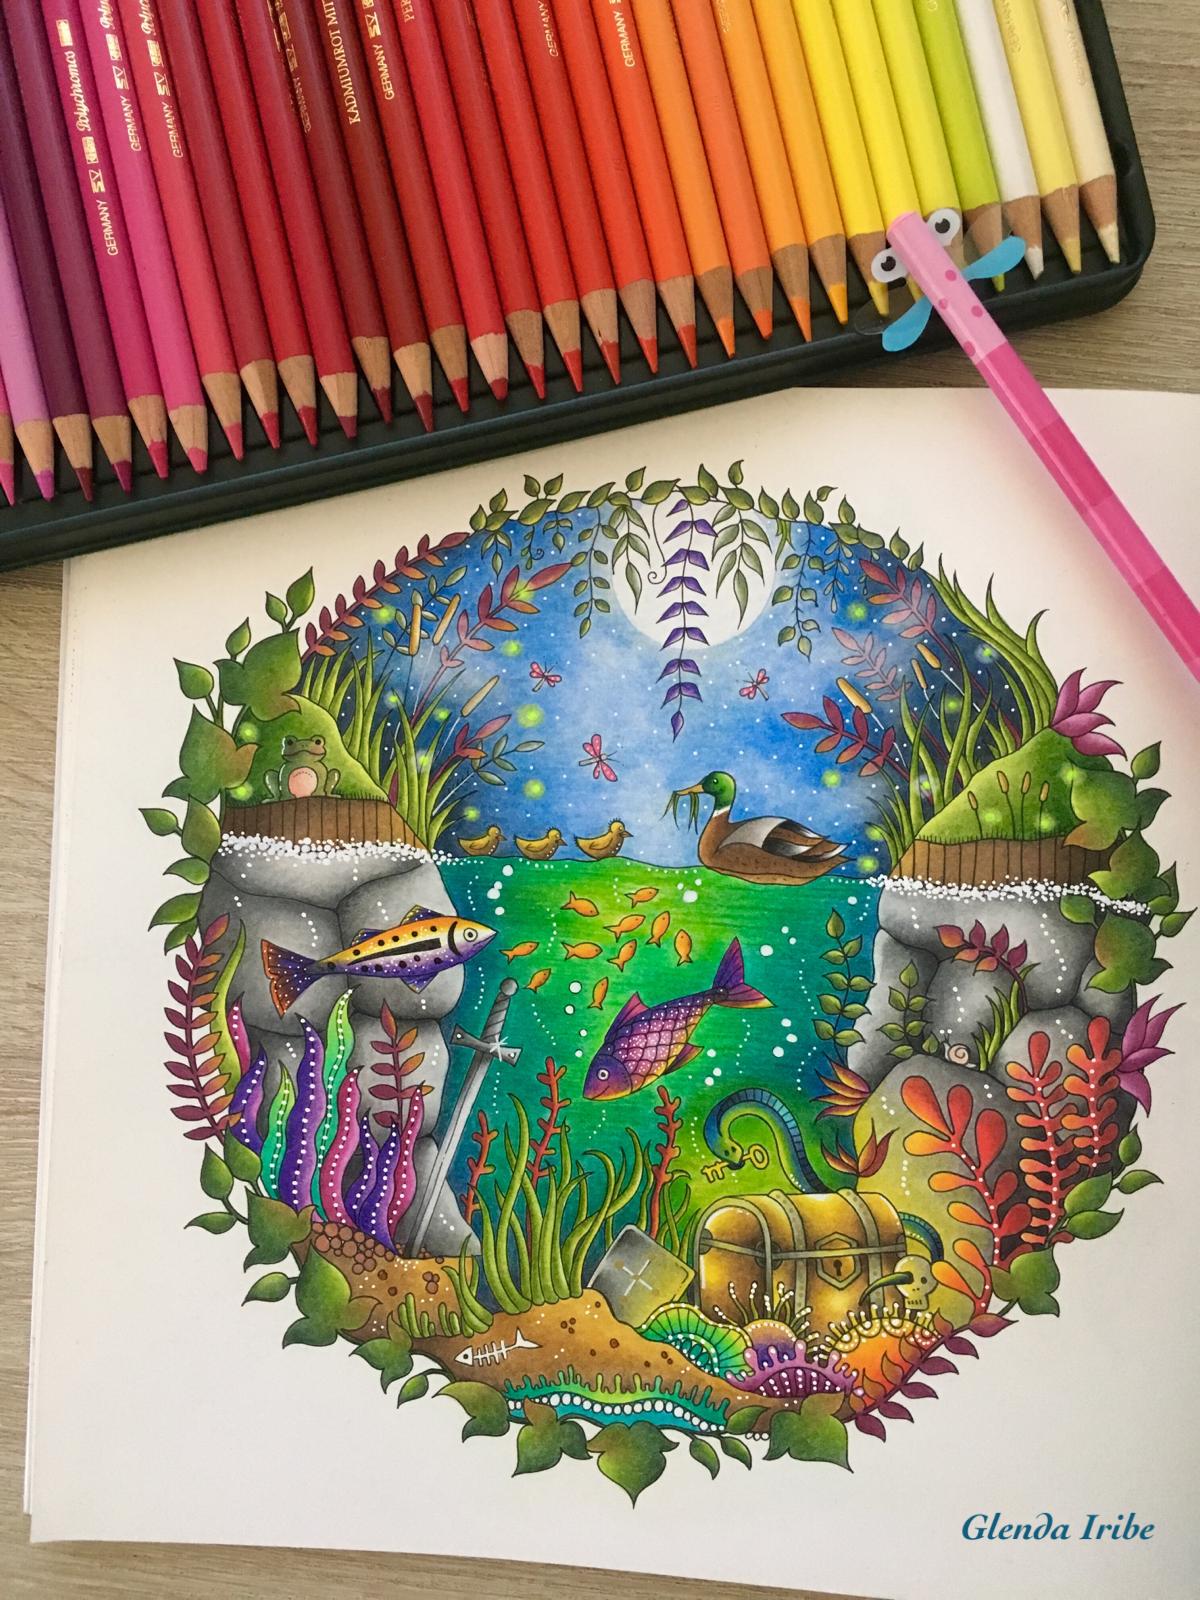 Enchanted Forest De Johanna Basford